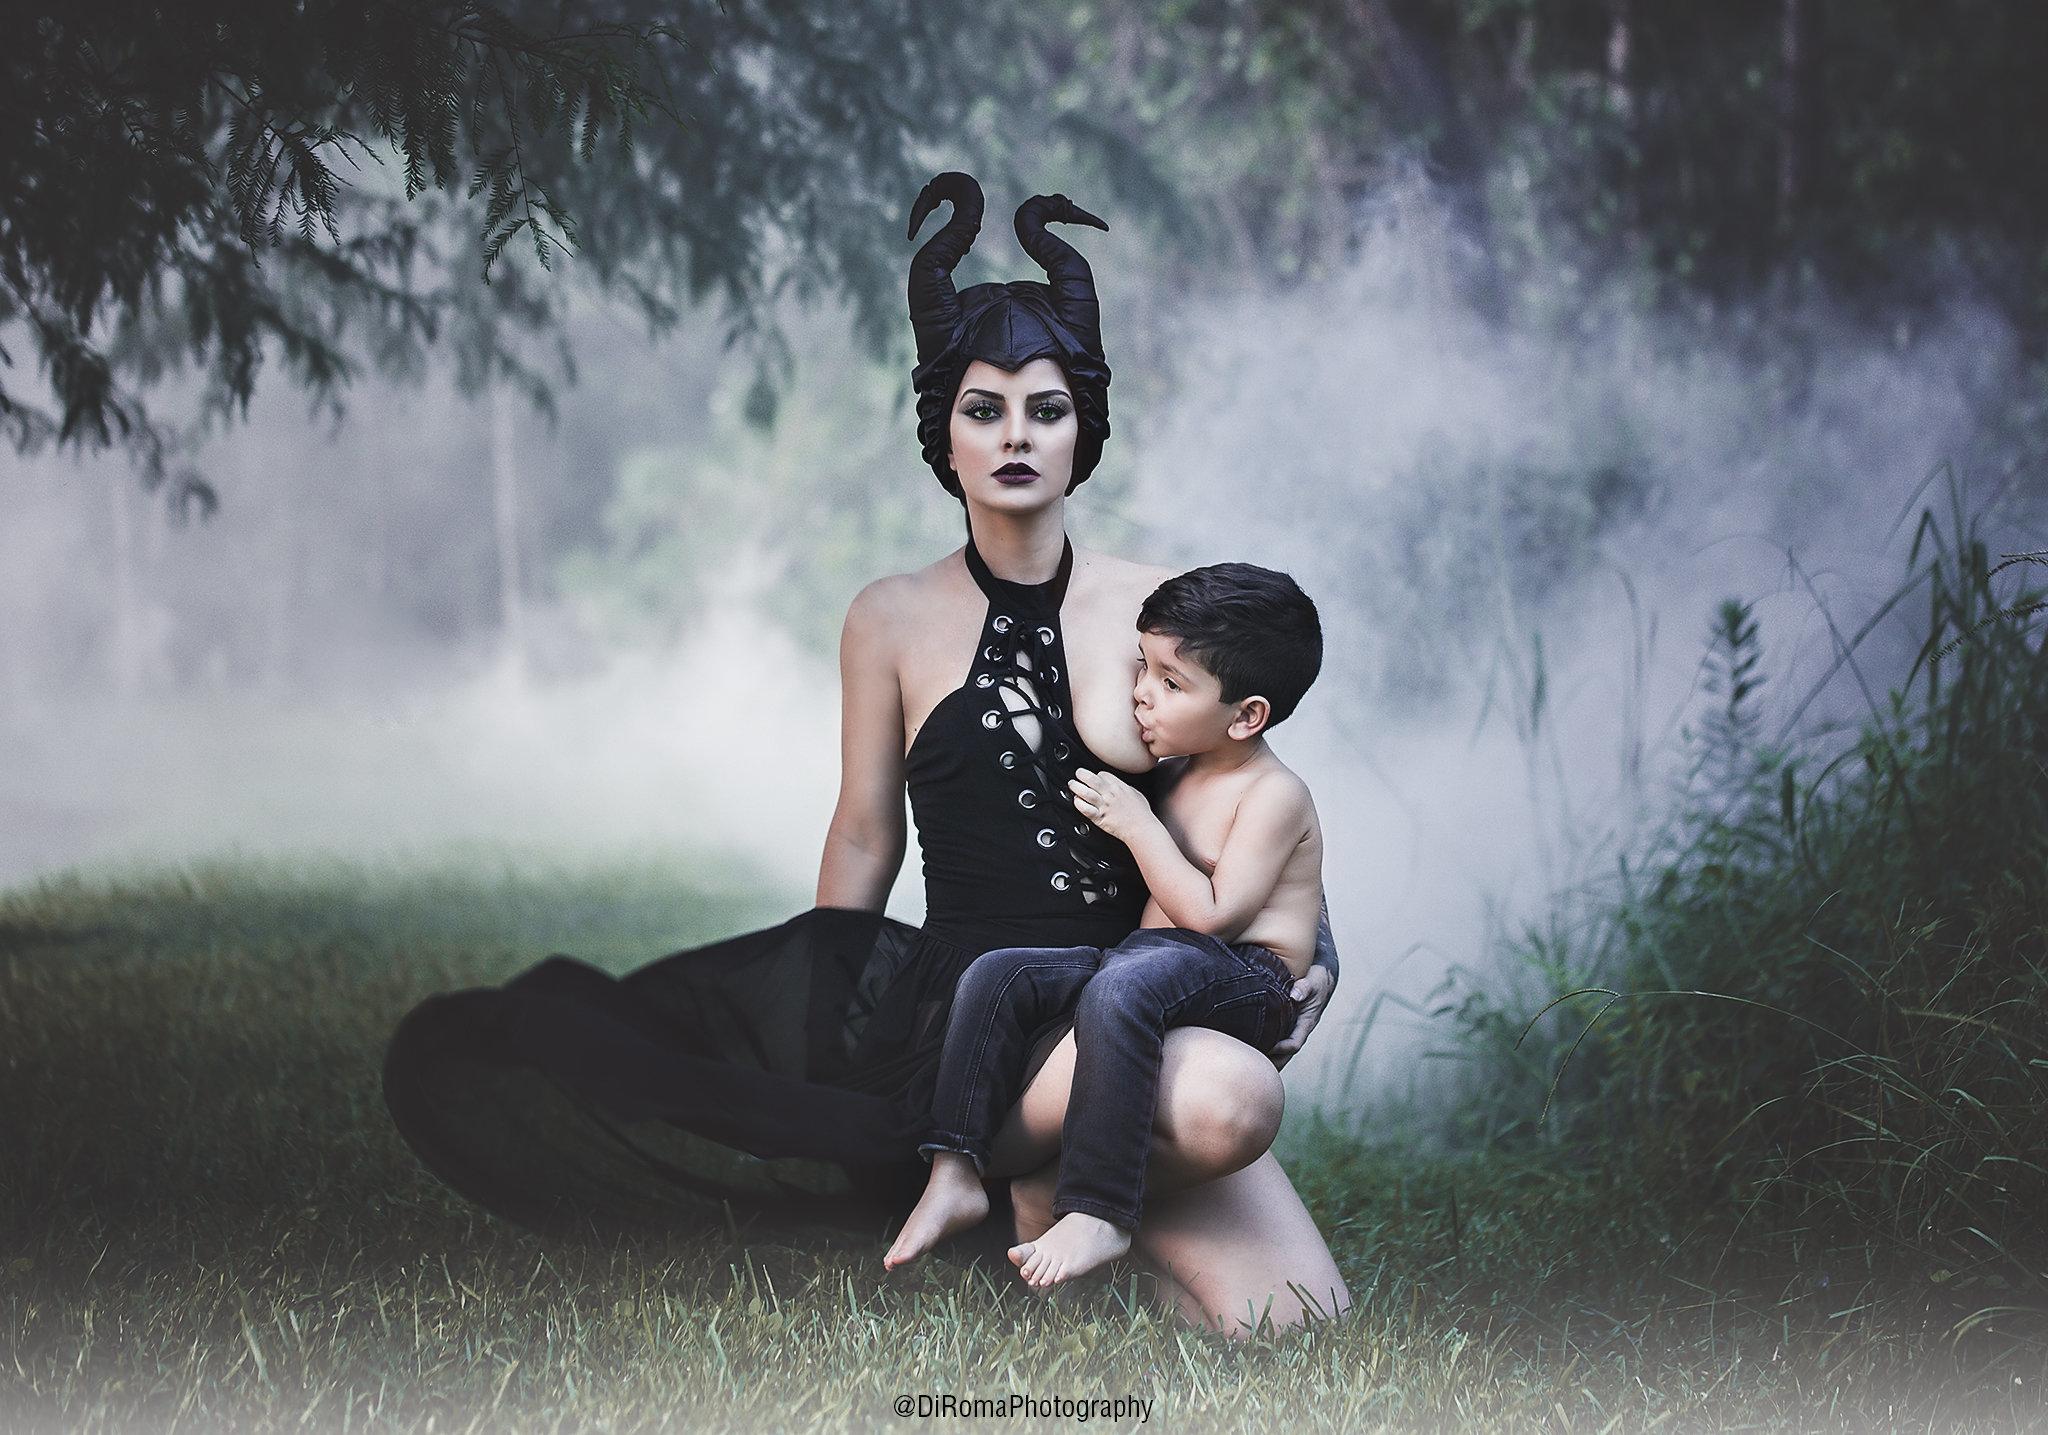 Yaky Di Roma, a Venezuelan photographer, dressedas